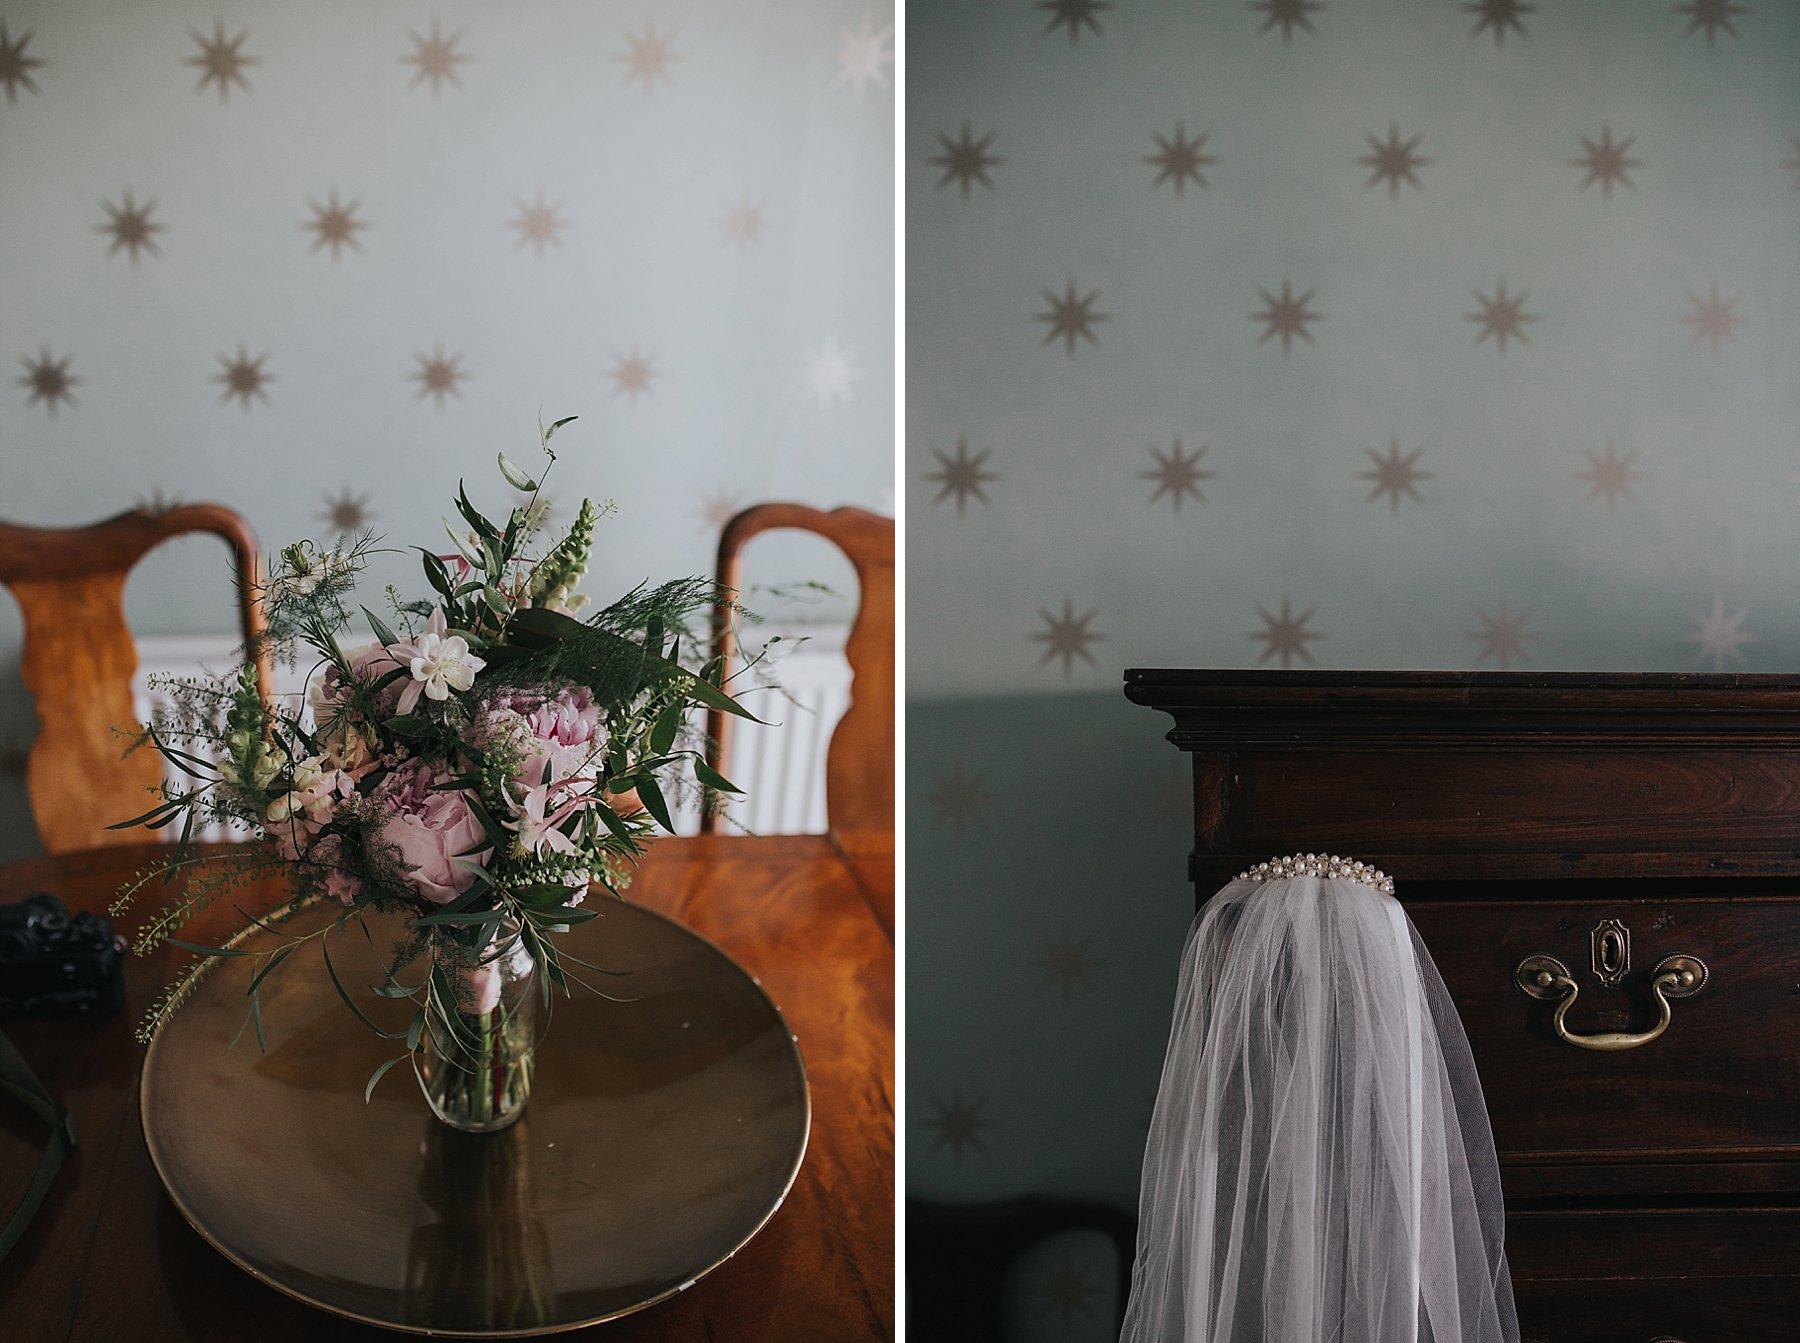 169 wild flower wedding bouquet veil star wallpaper.jpg